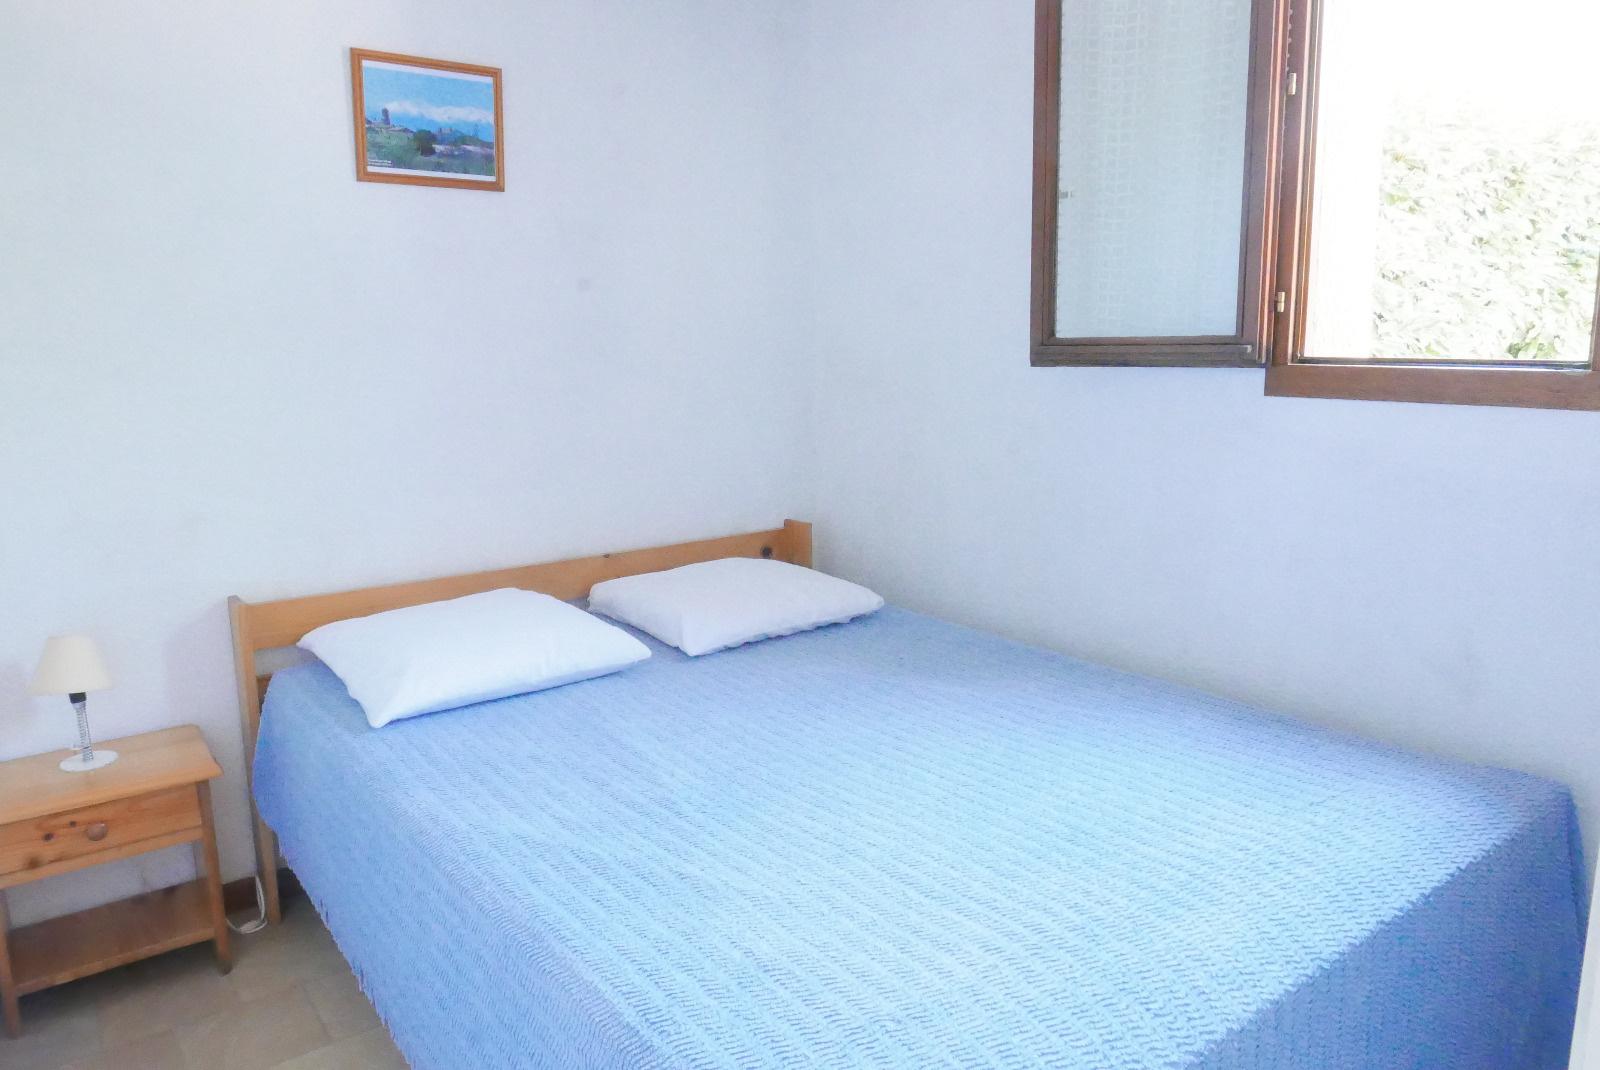 Chambre RDC avec lit en 140*